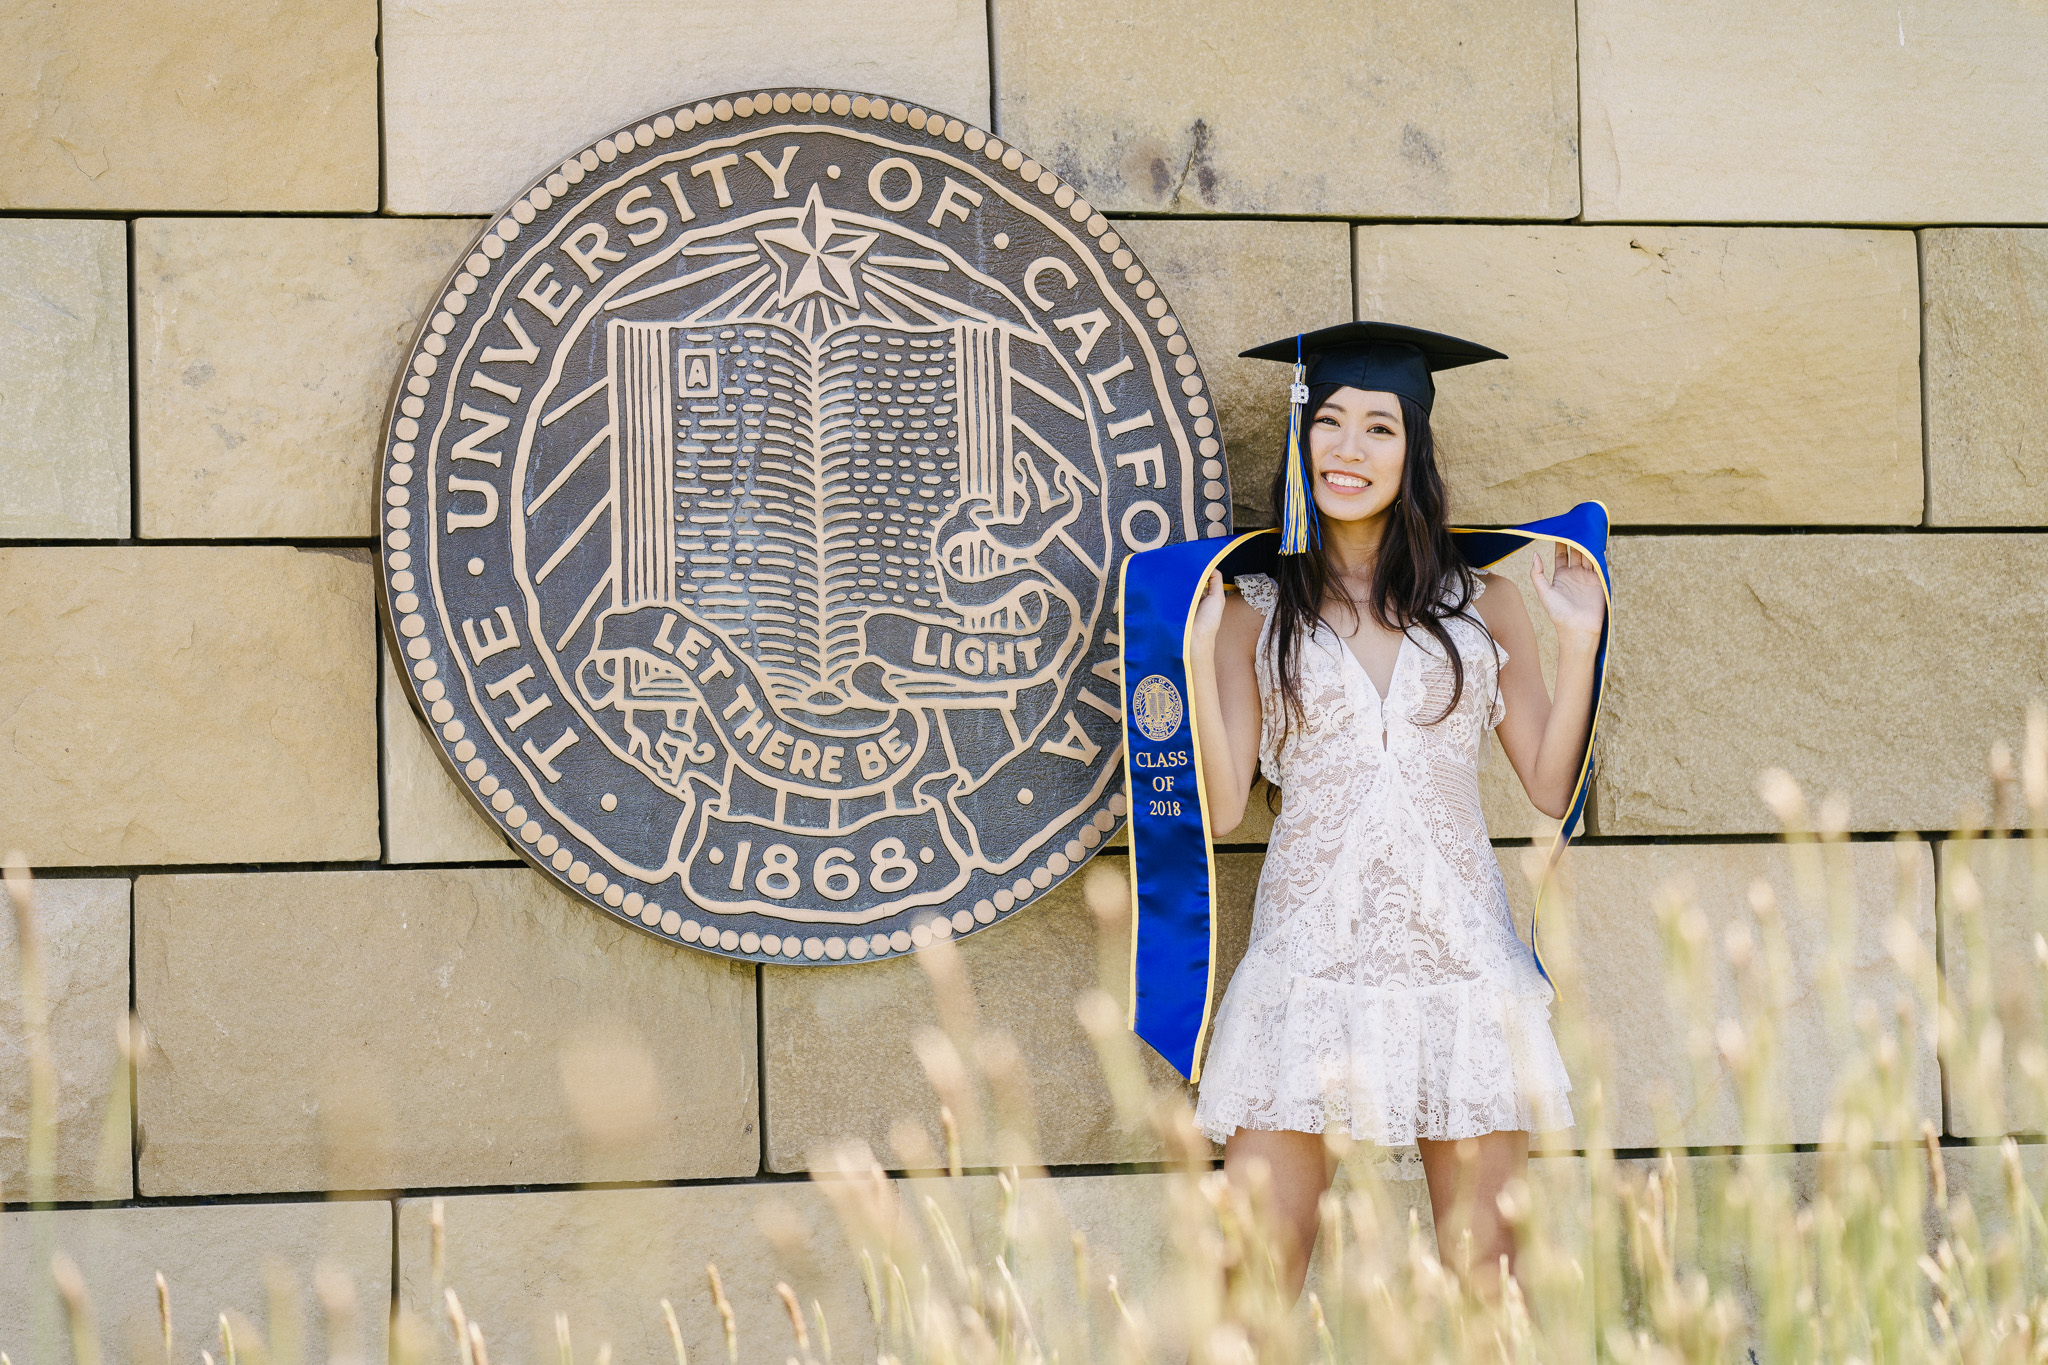 [5-16-2018] Vi's Graduation Photoshoot11.jpg